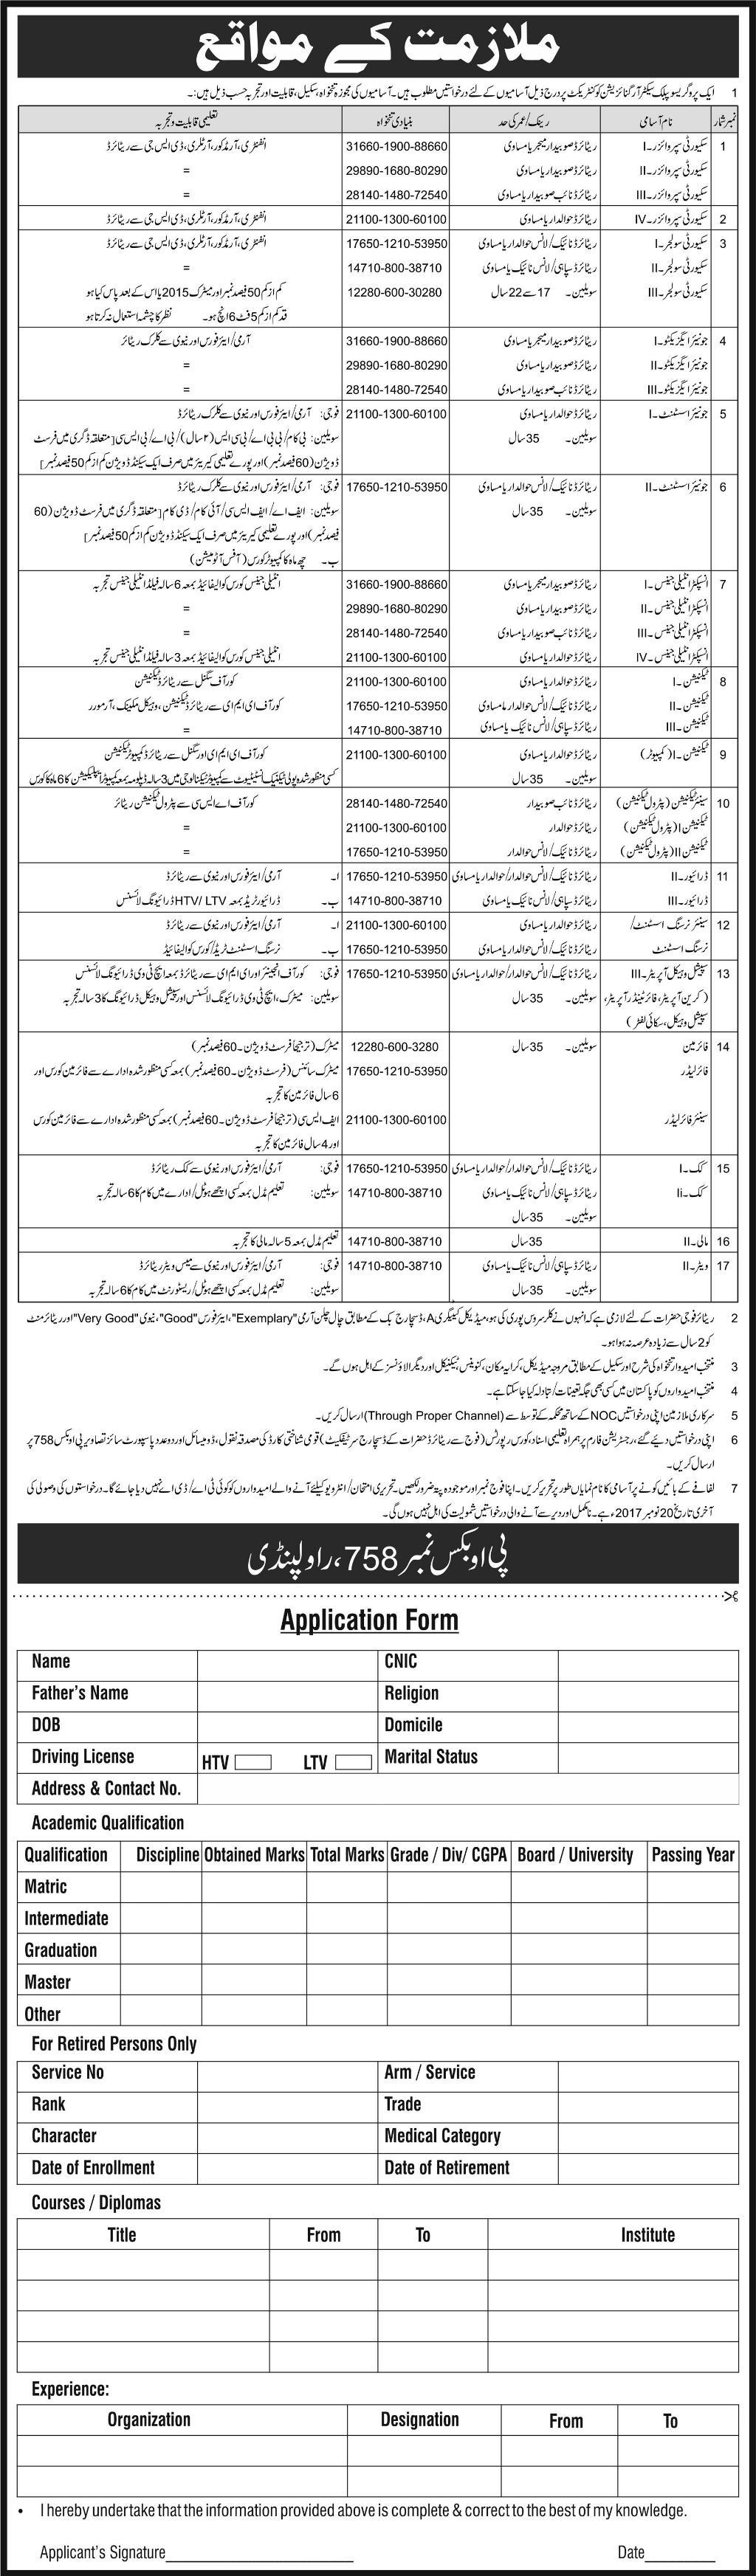 PO Box 758 Rawalpindi Jobs 30 October 2017 in Pakistan Army